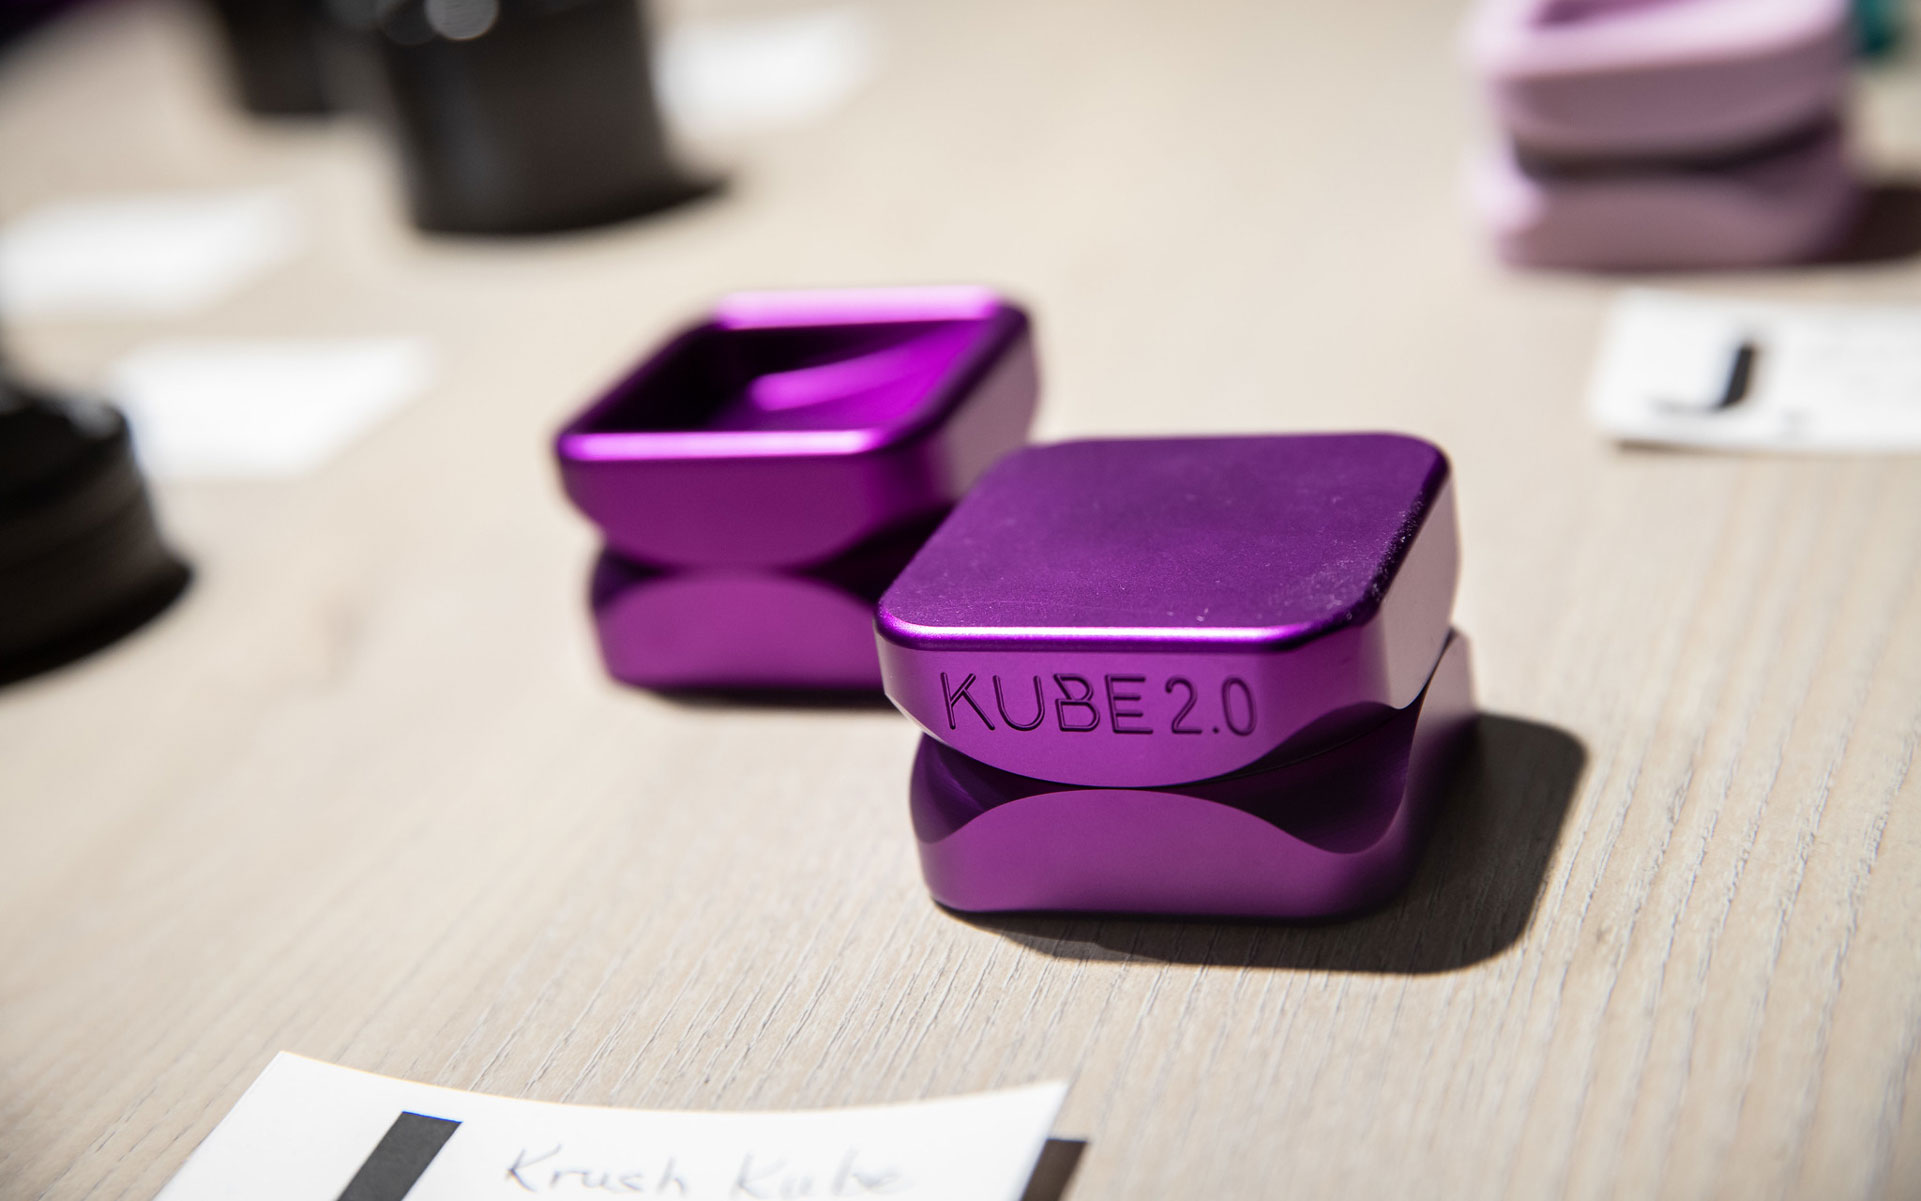 Krush grinders kube 2.0